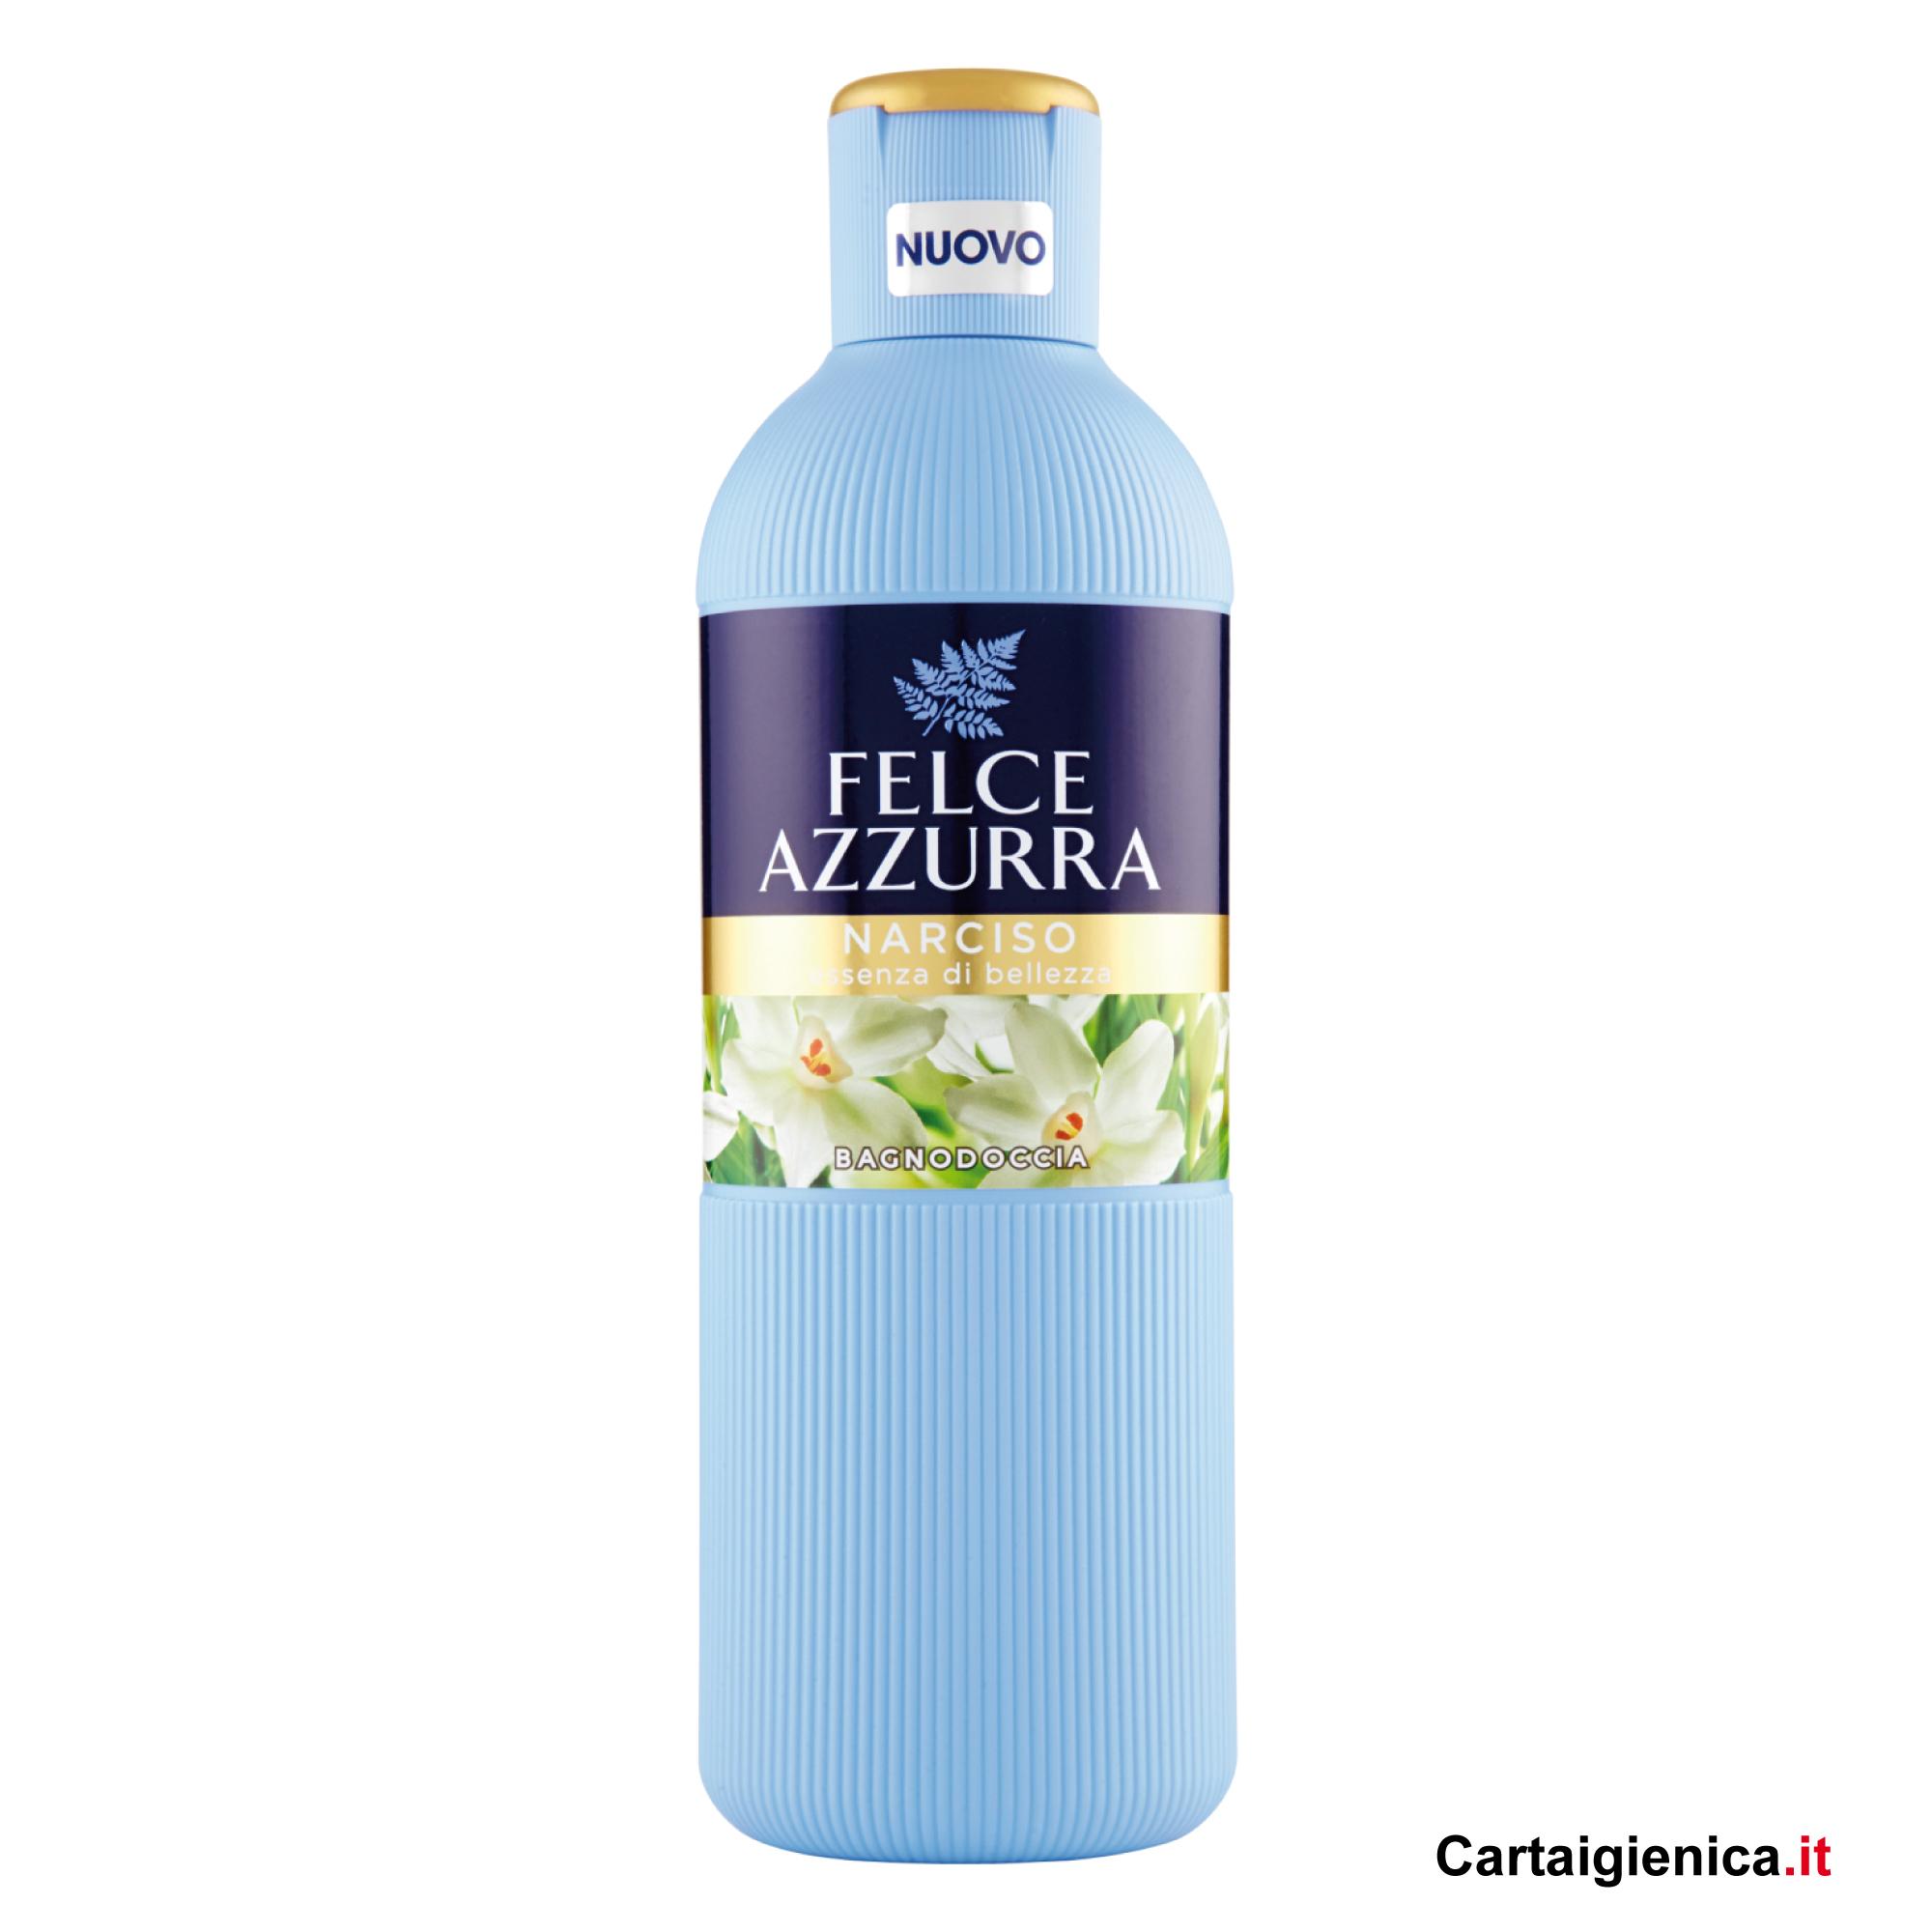 felce azzurra bagnodoccia narciso 650 ml